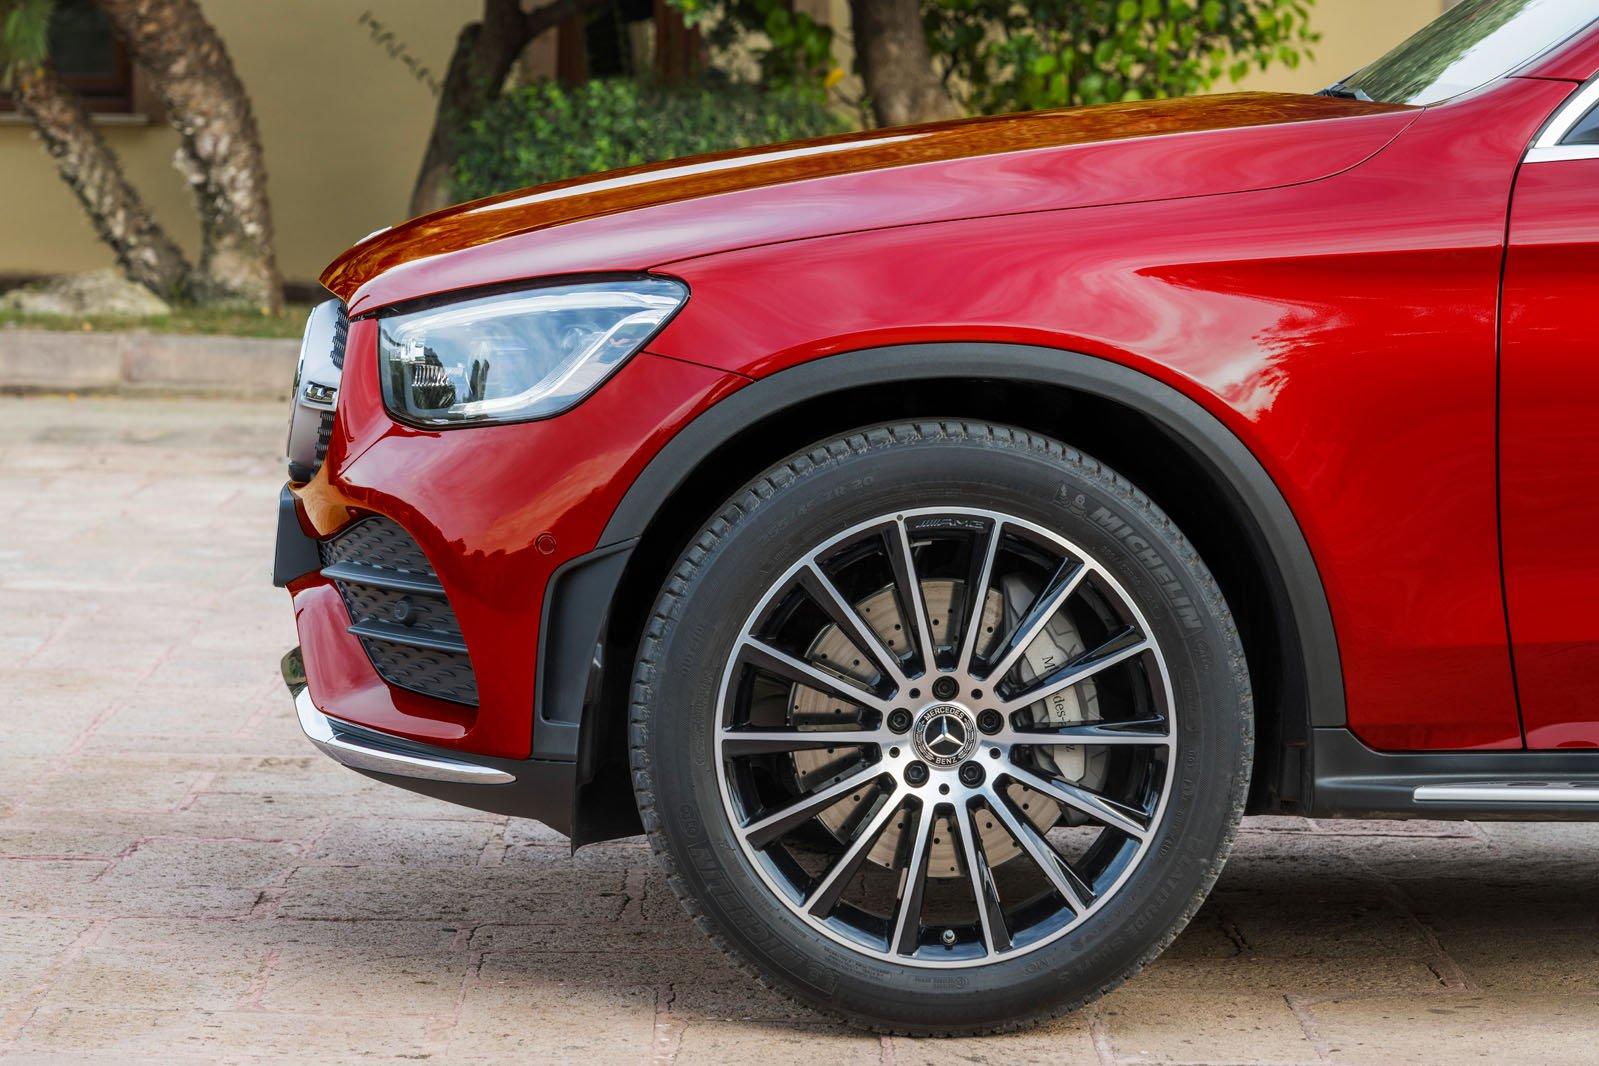 Mercedes GLC Coupe 2019 facelift front wheel detail